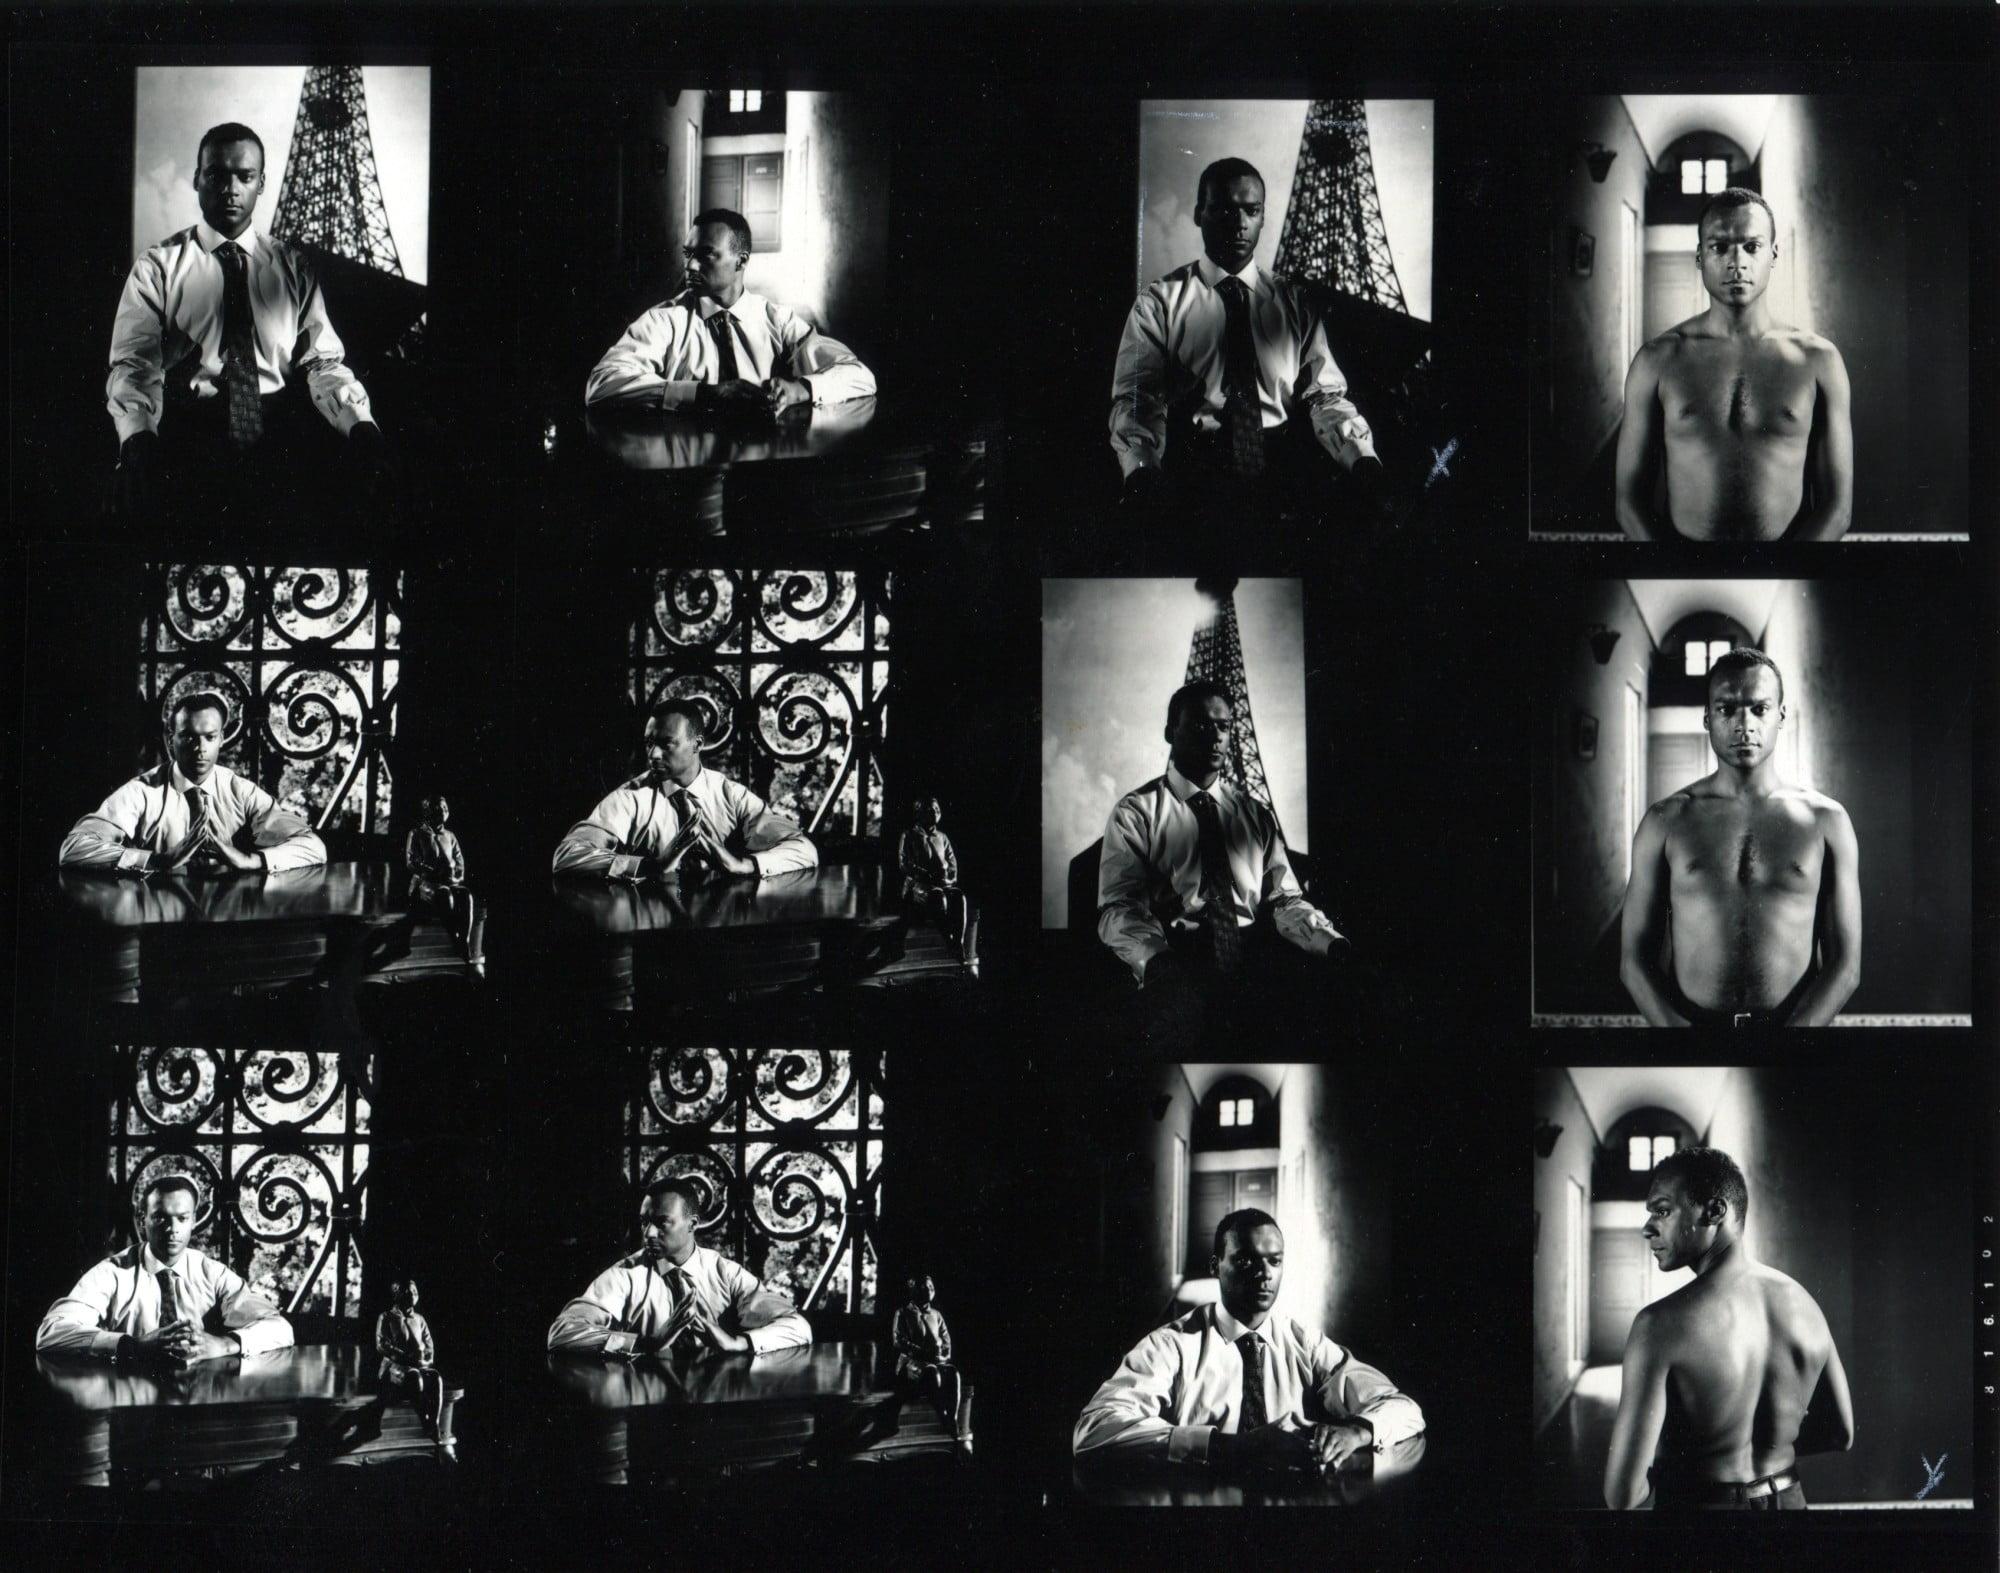 Frabtz Fanon - Black Skin, White Masks